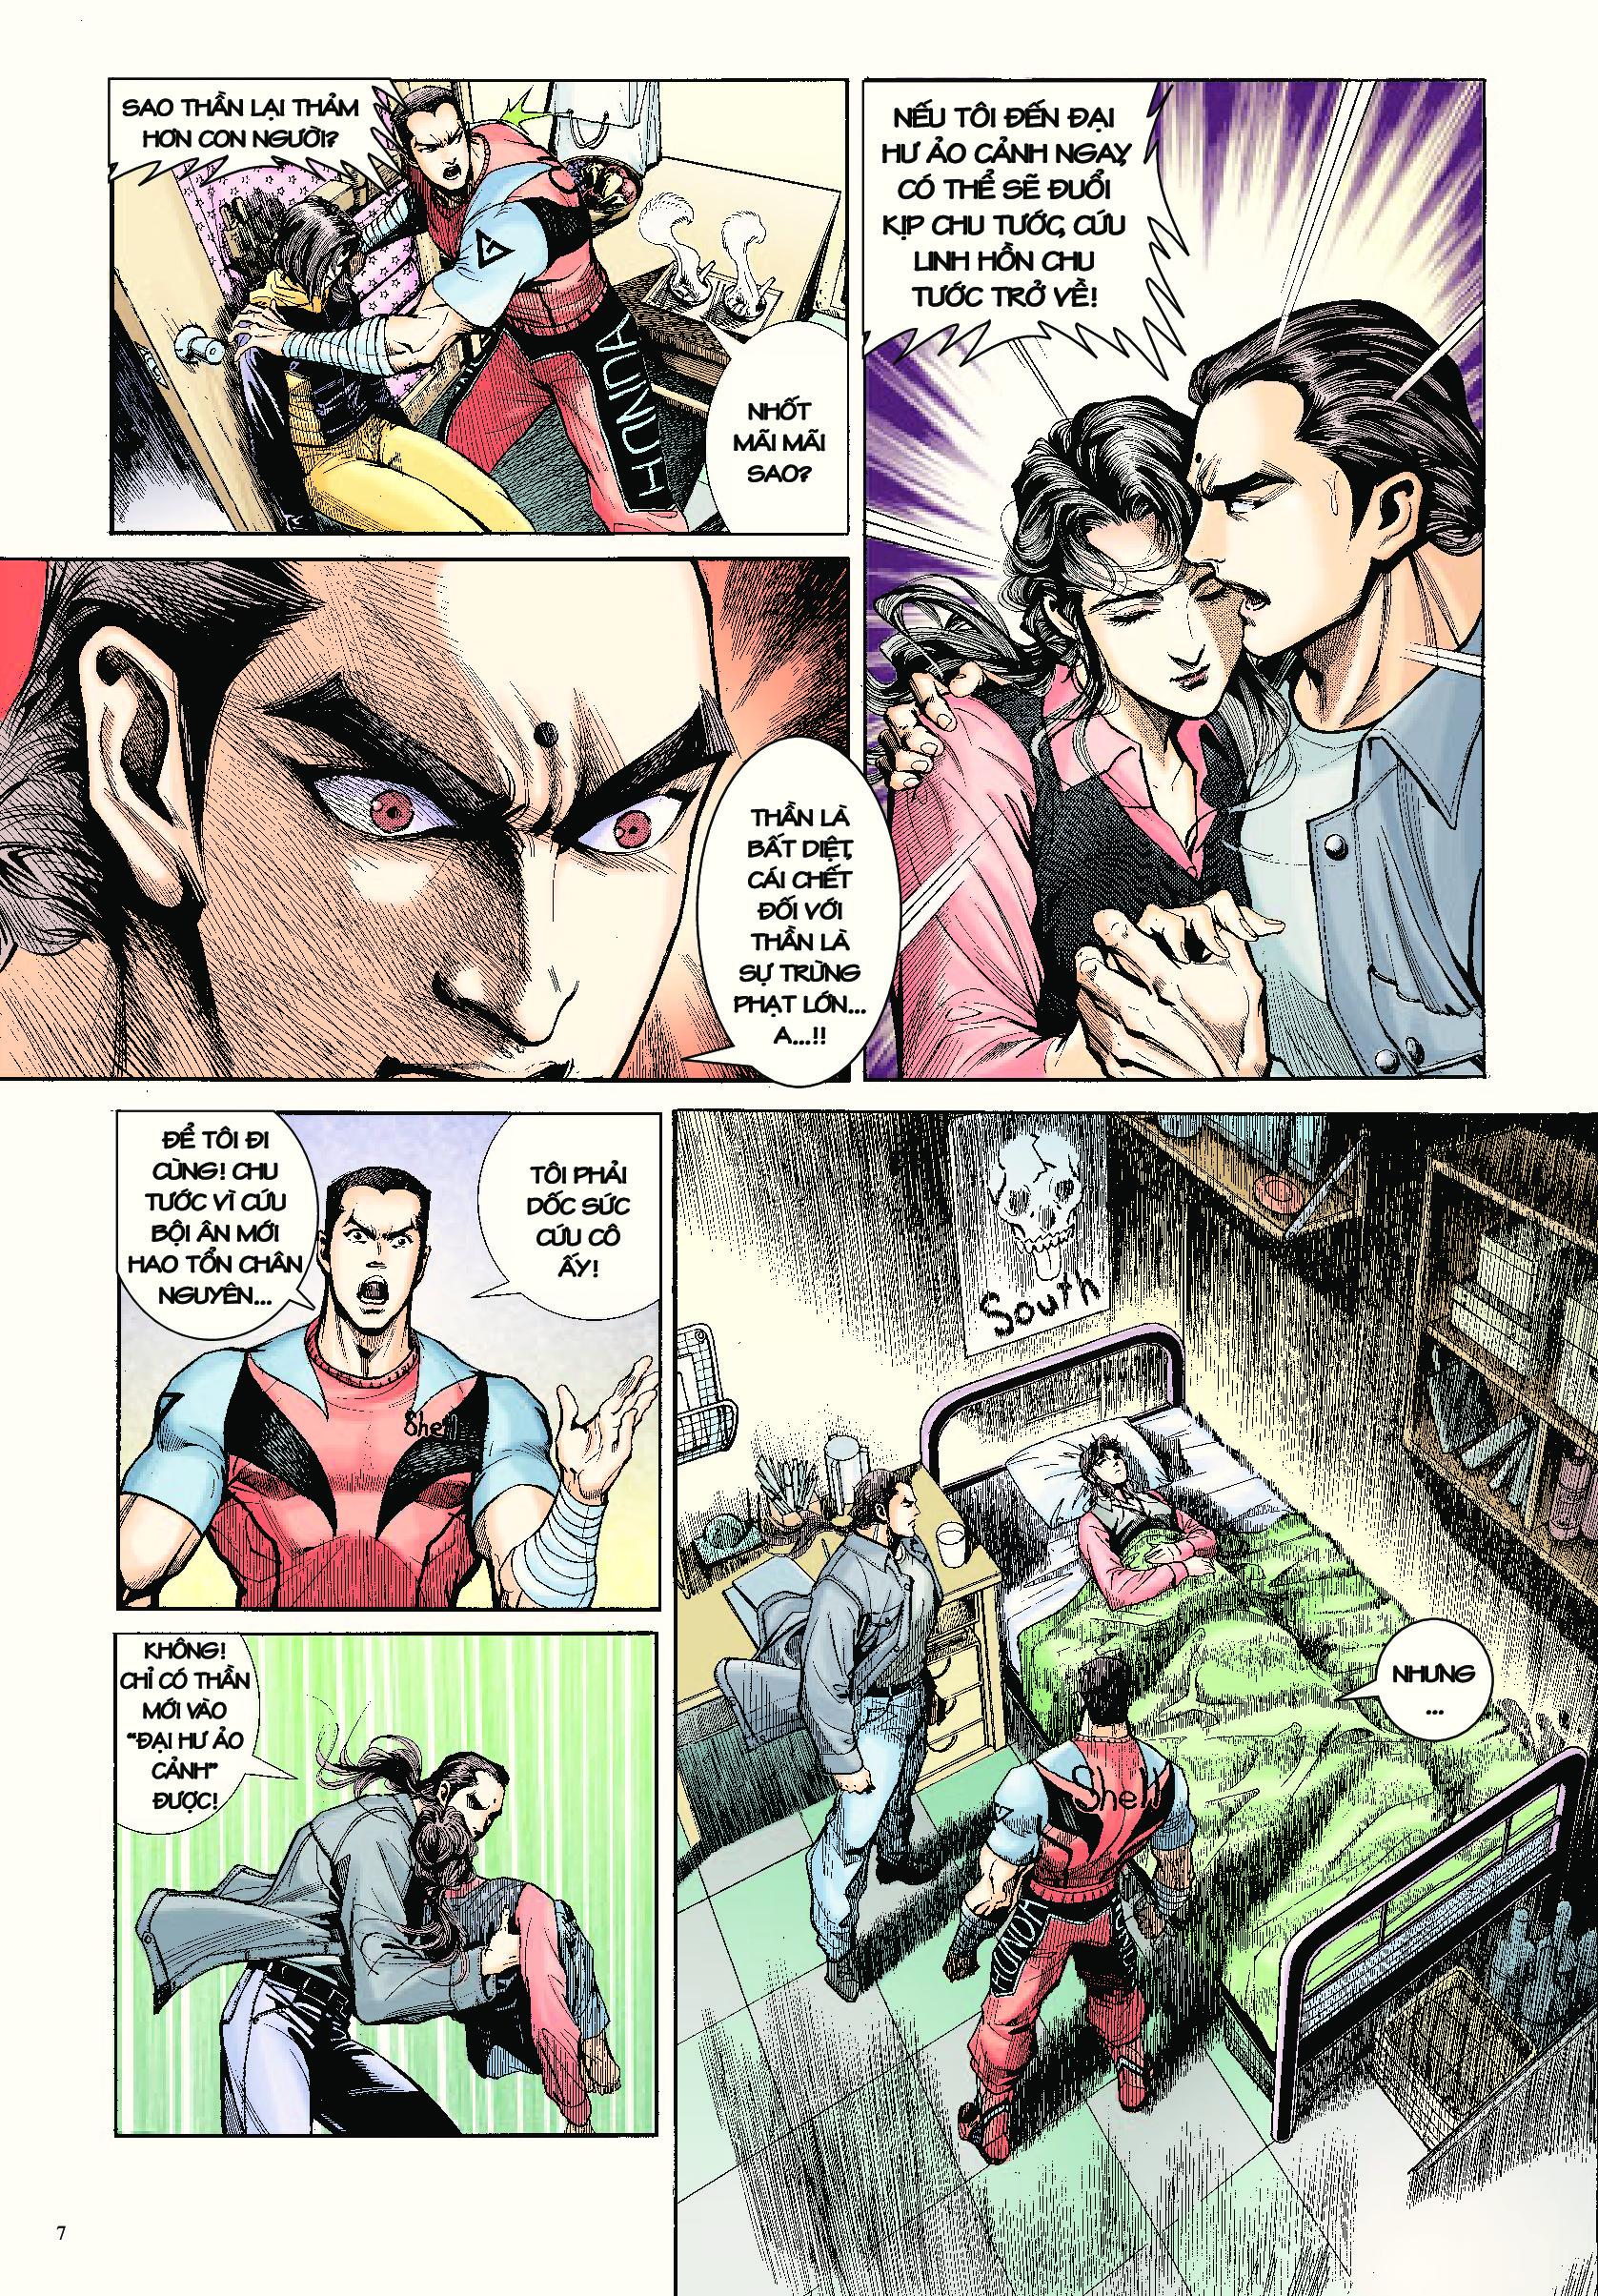 Long Thần - Trung Bộ Khúc Chap 19 - Next Chap 20